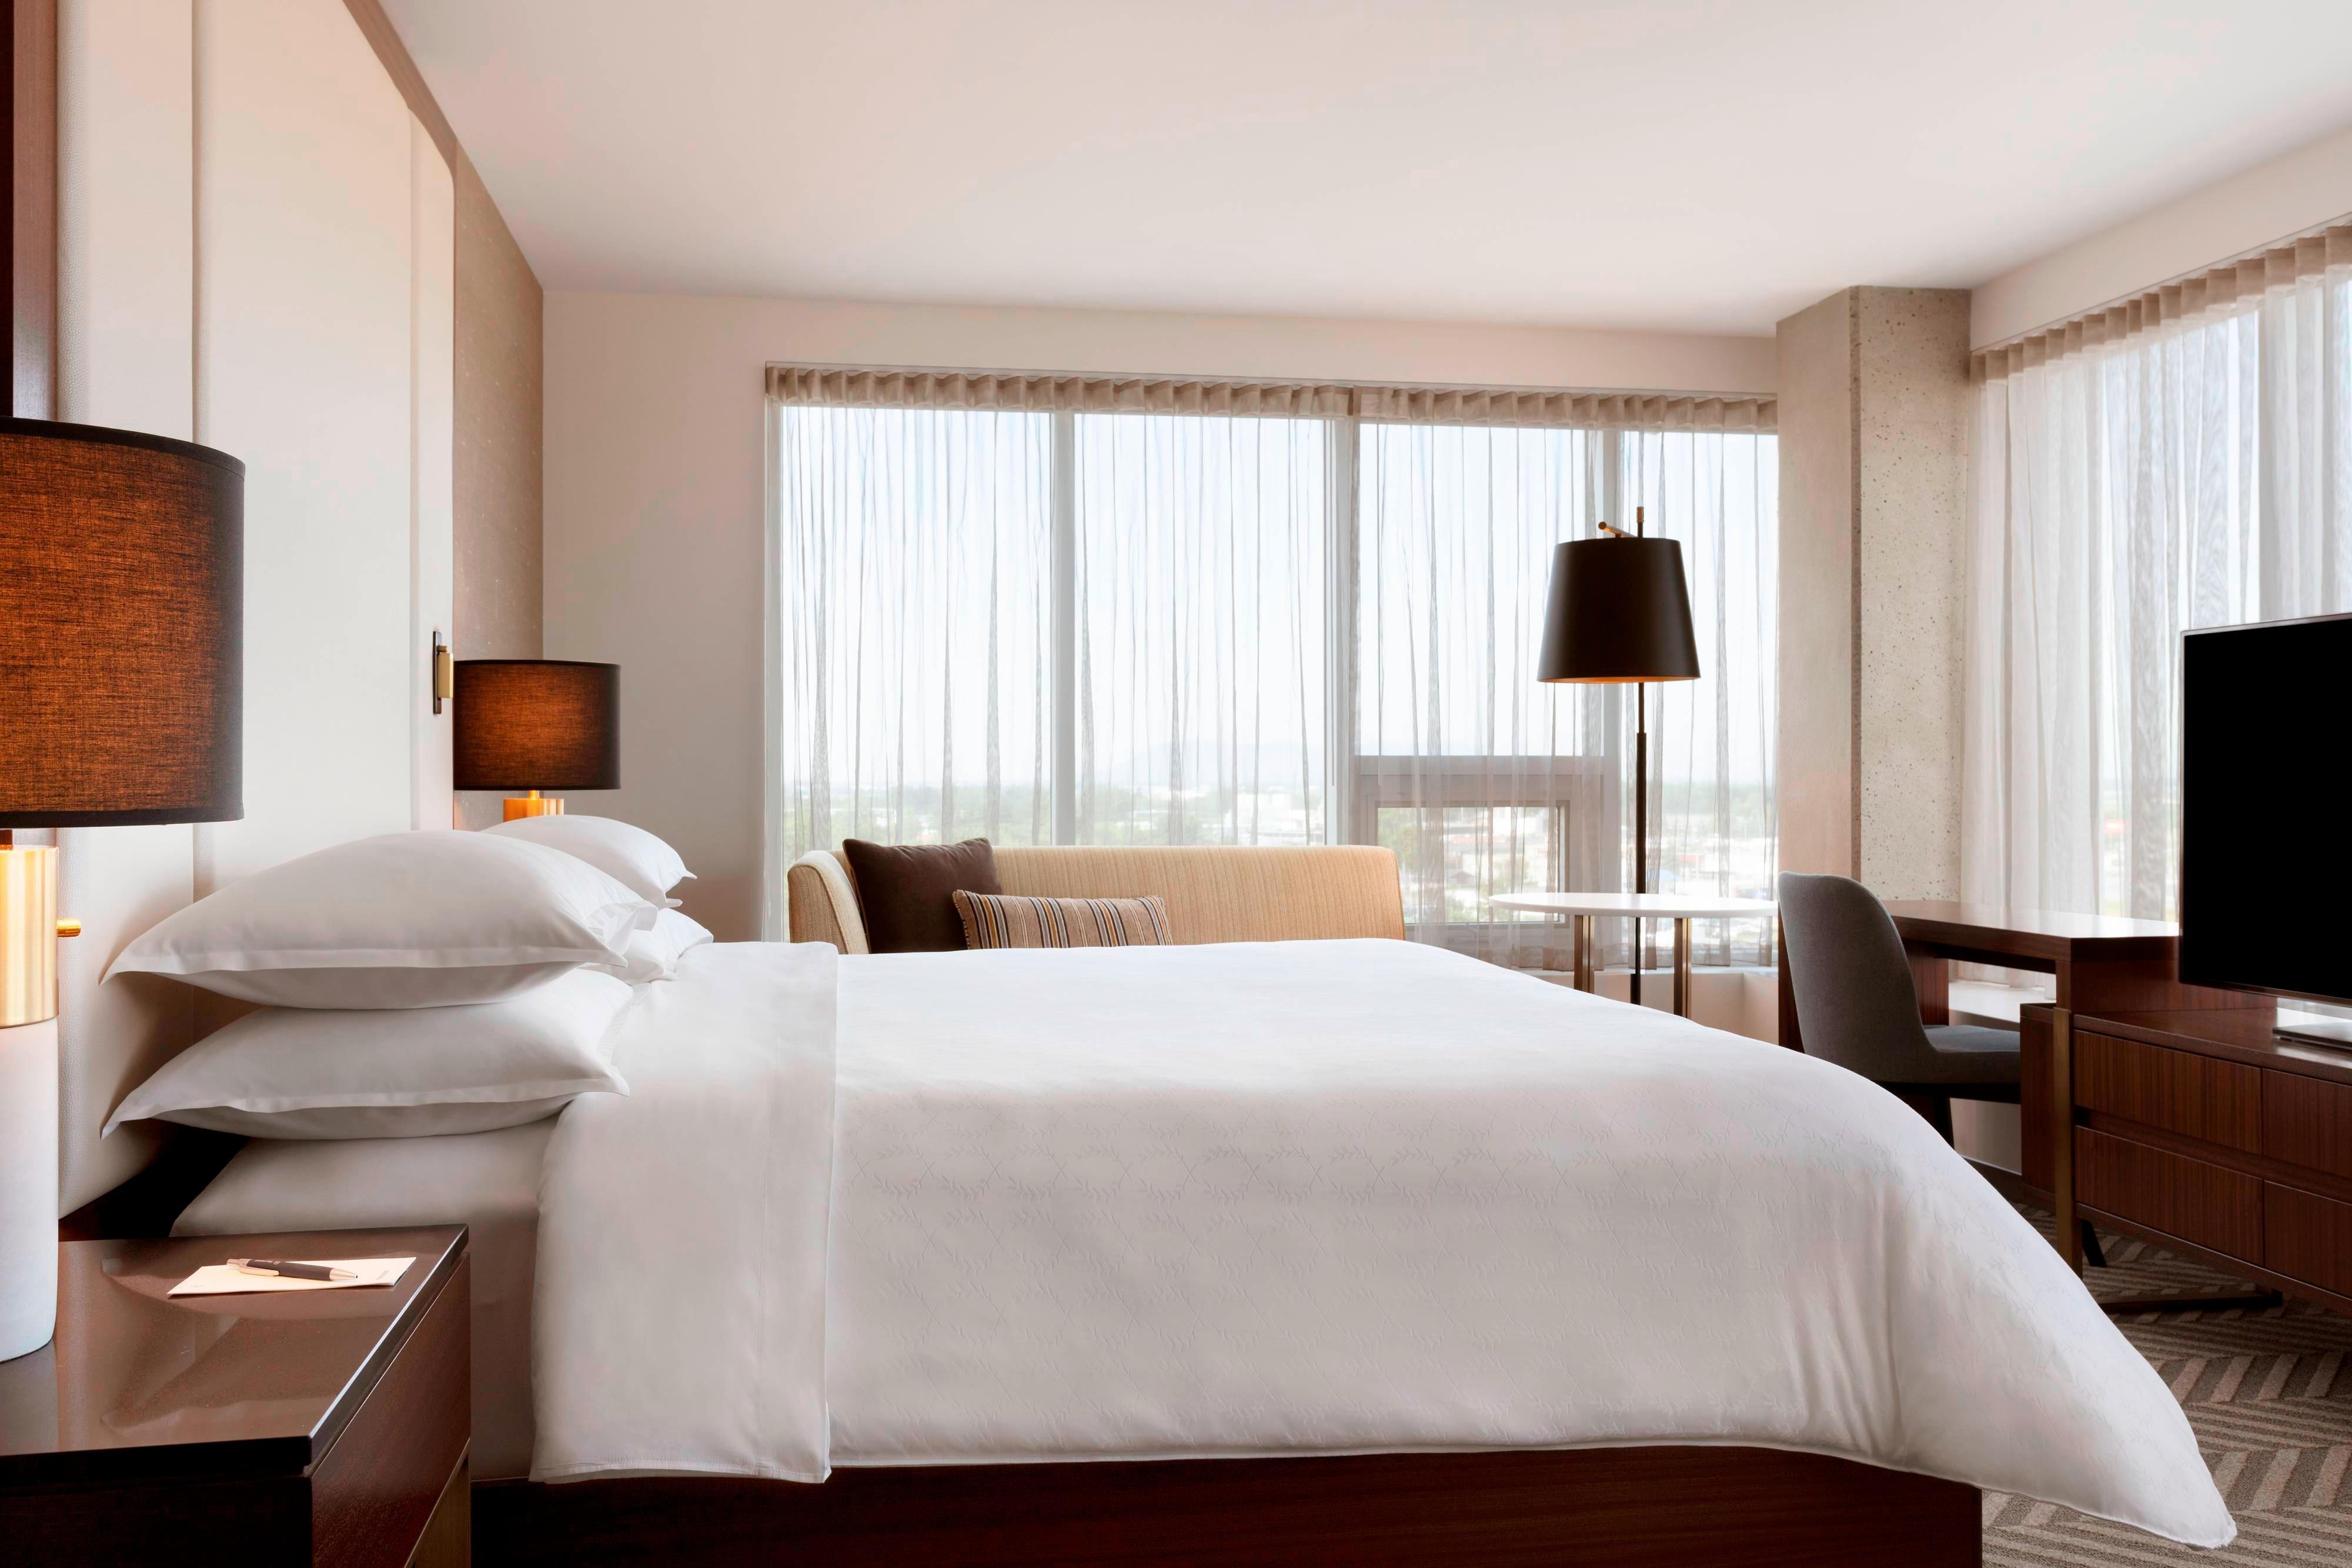 Chambre d'angle avec lit king size